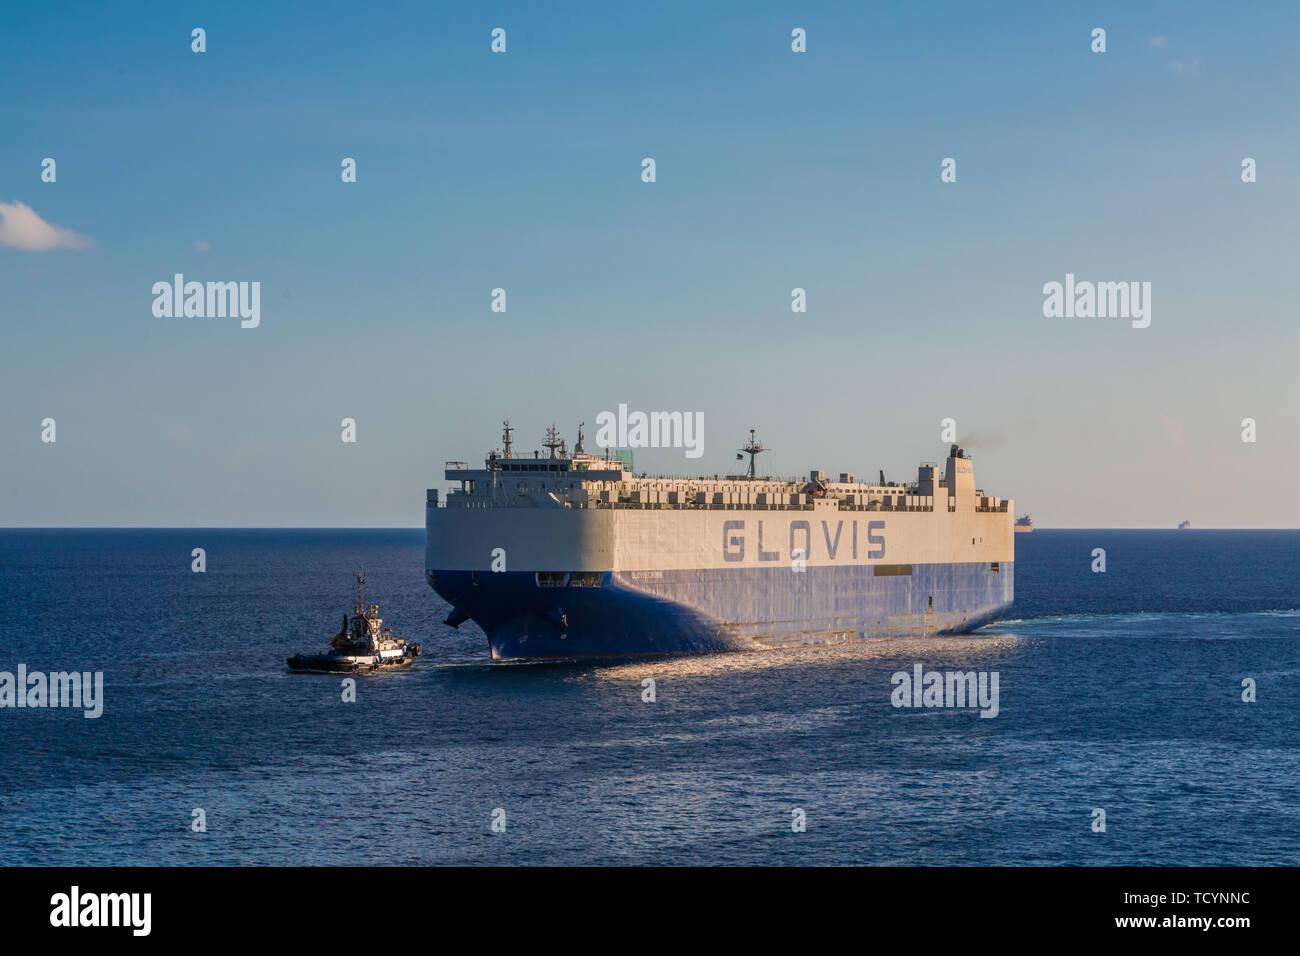 Glovis Stock Photos & Glovis Stock Images - Alamy